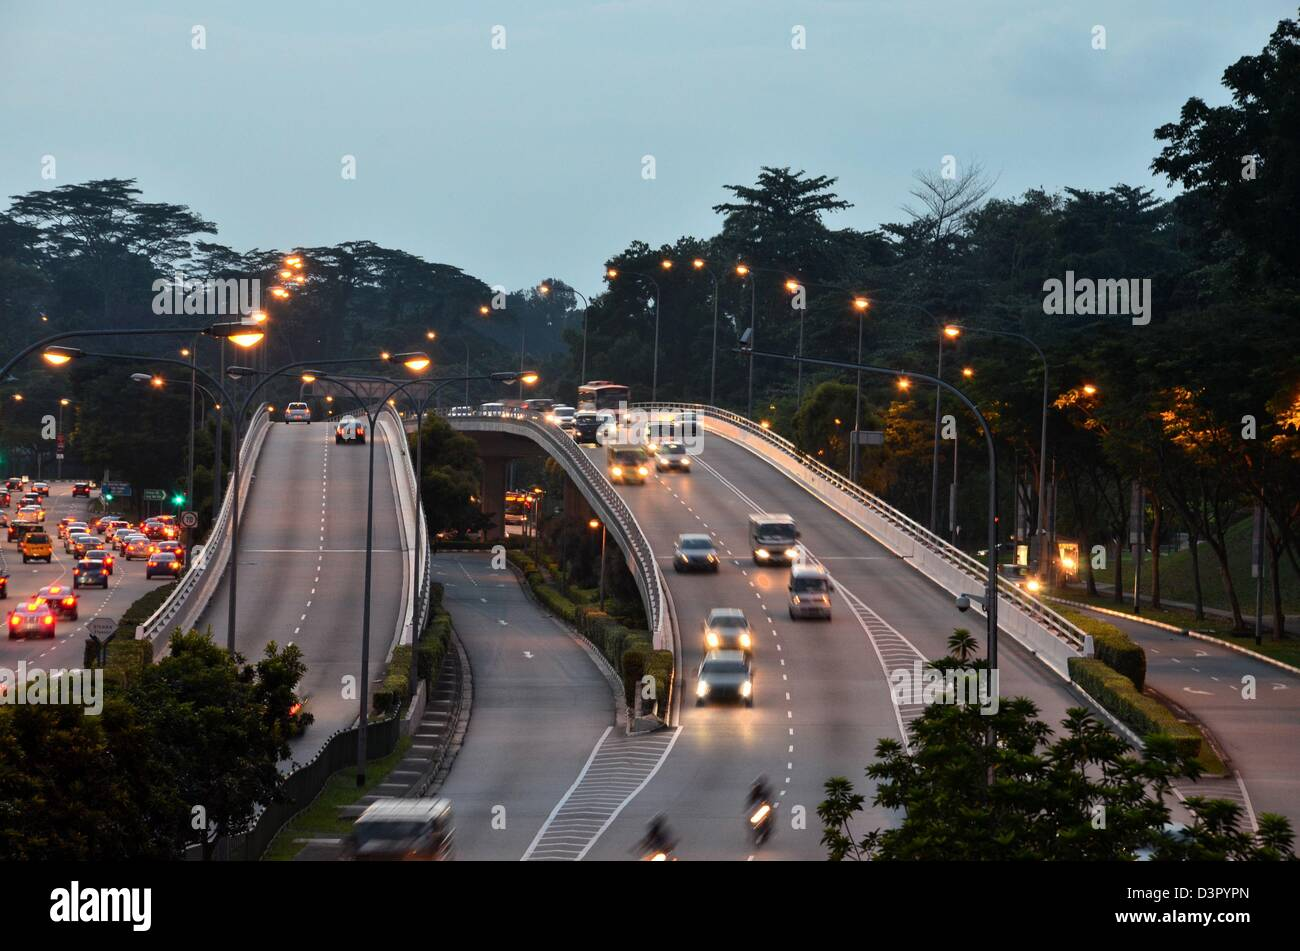 Evening car traffic on flyover bridge - Stock Image